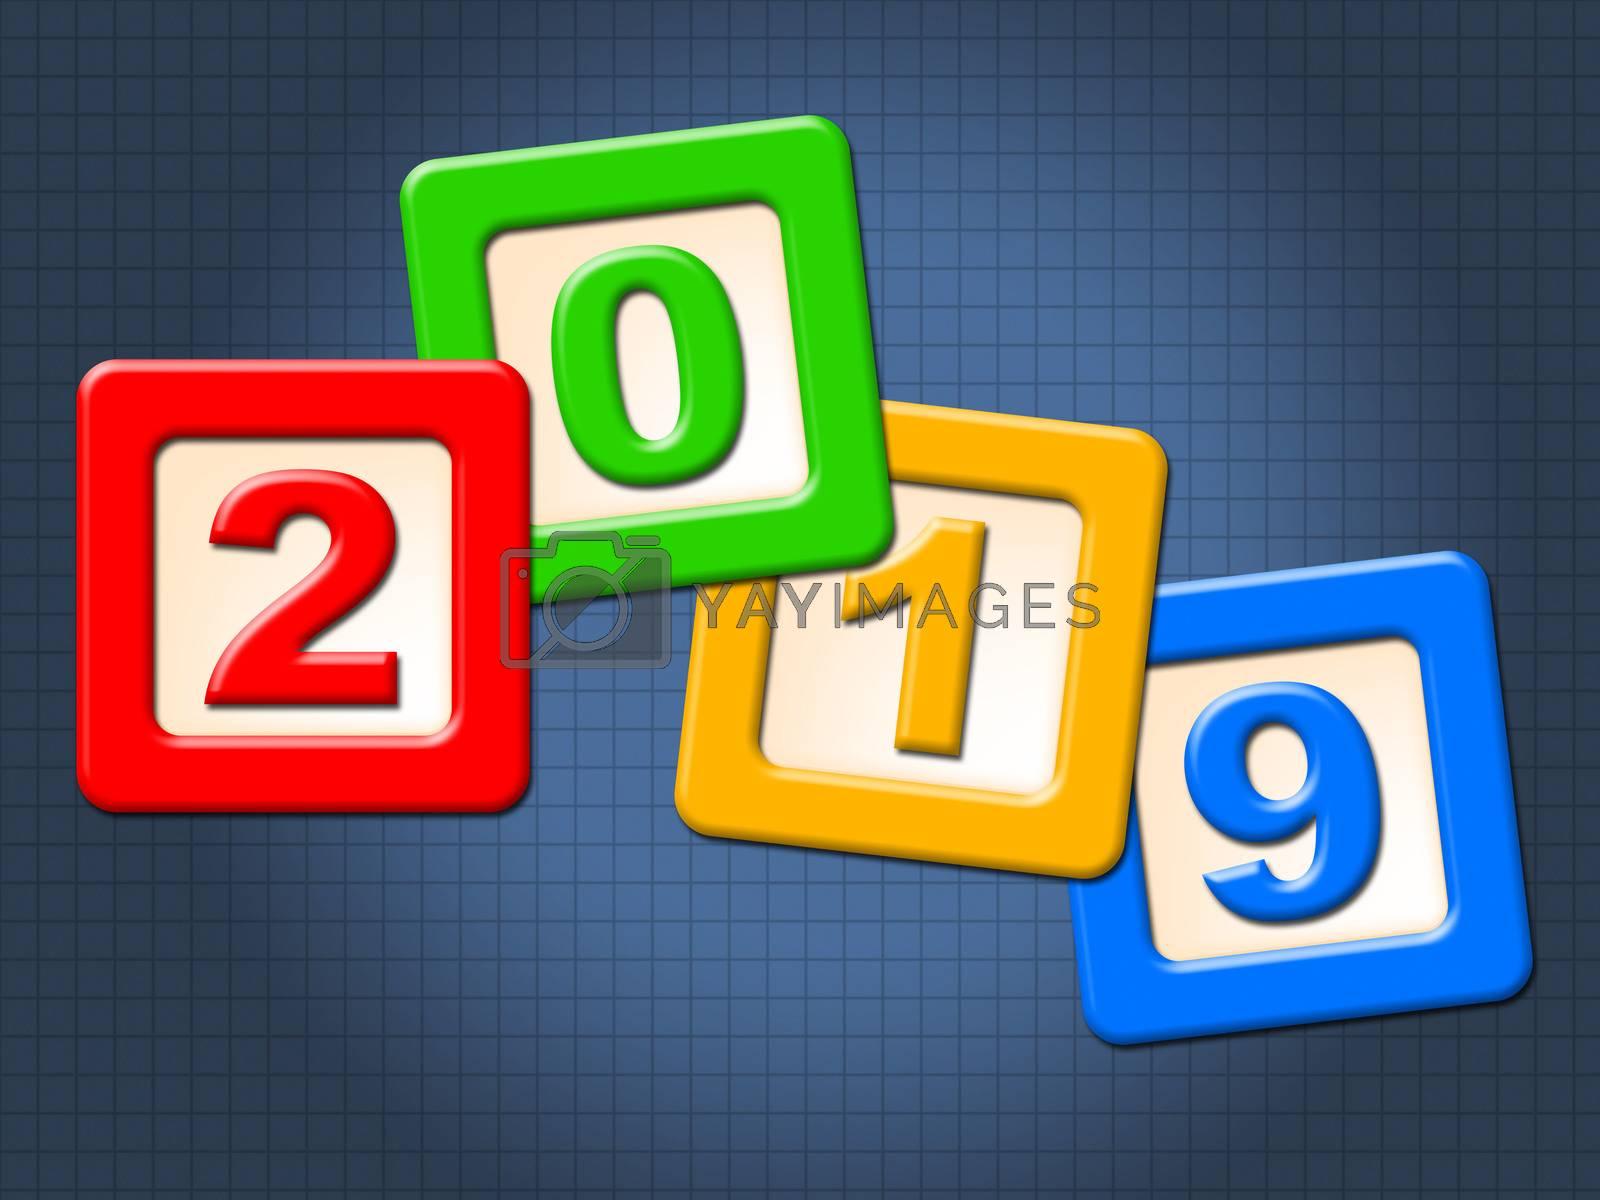 Twenty Nineteen Blocks Shows Happy New Year And Kids by stuartmiles